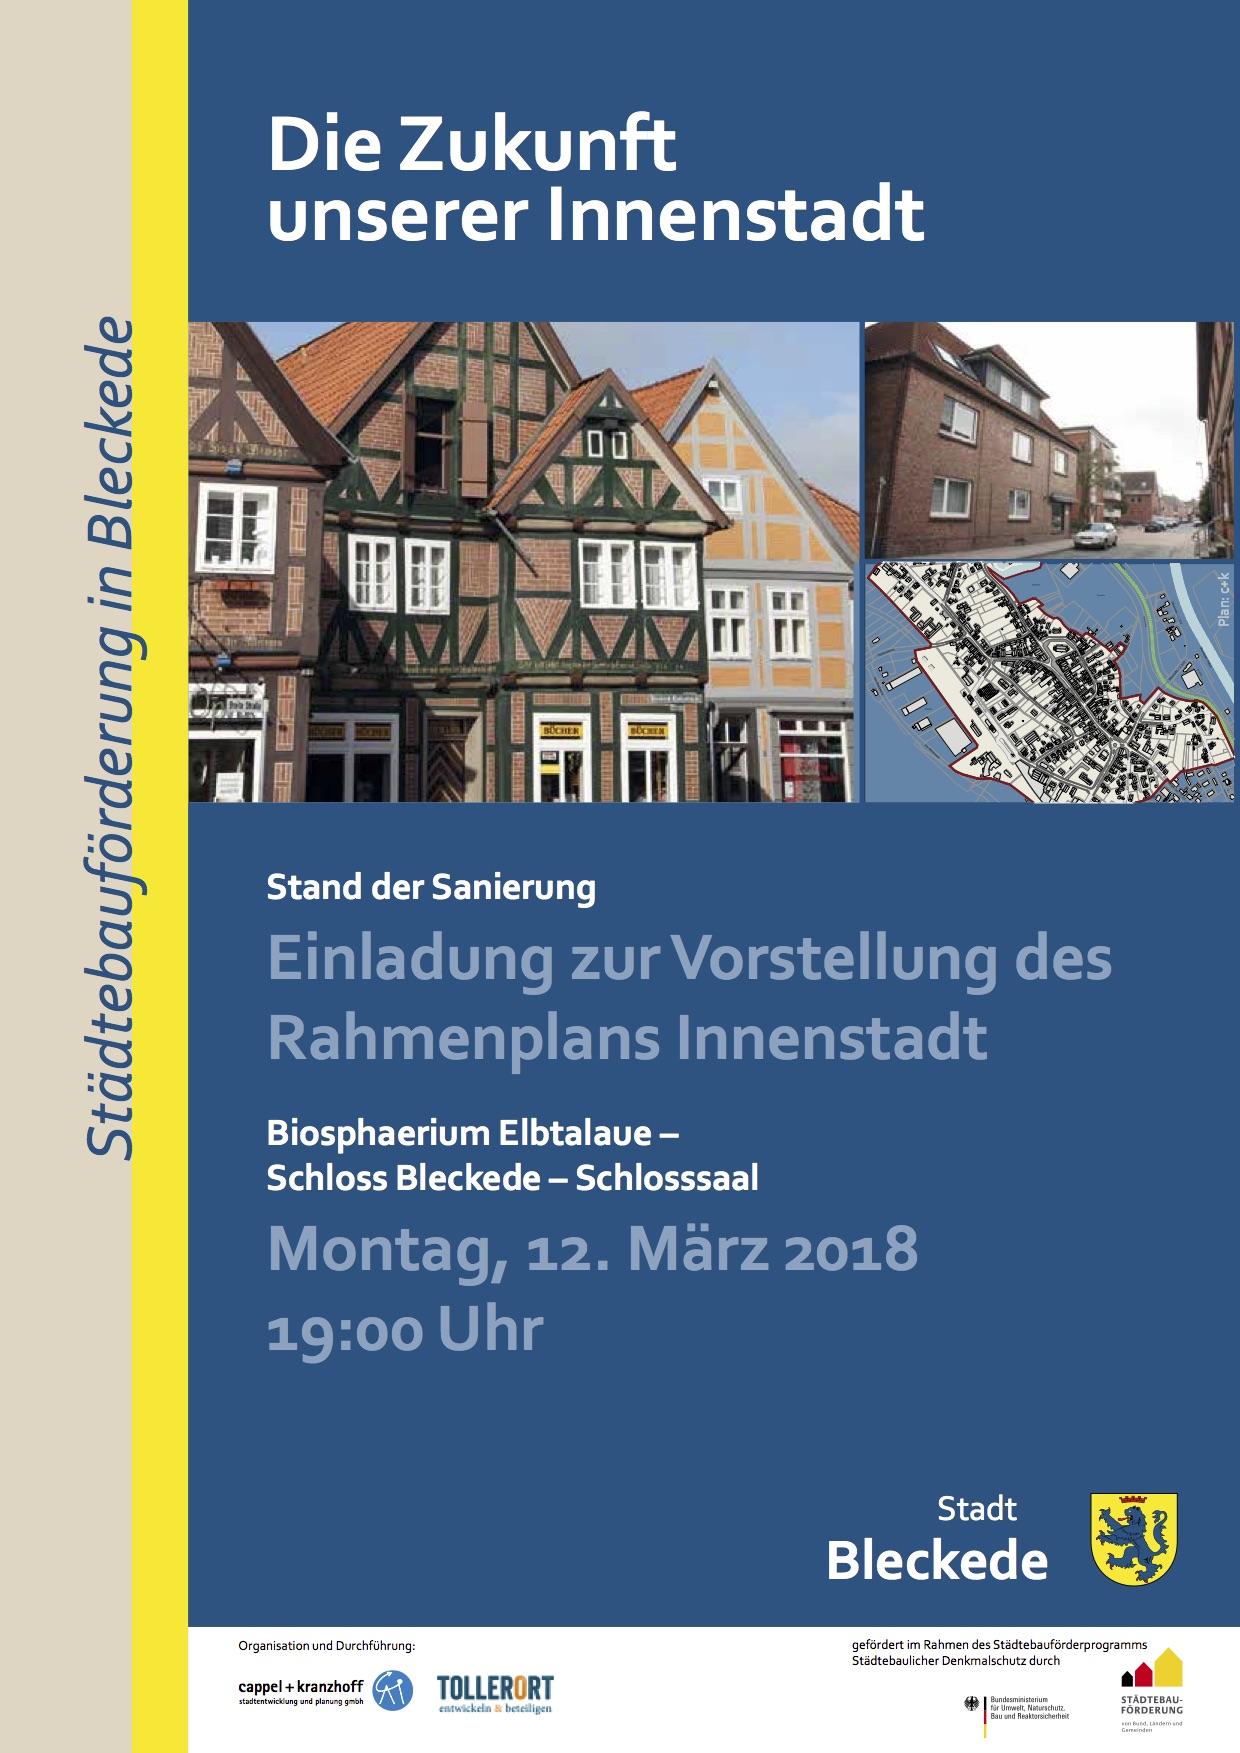 Rahmenplan Innenstadt Schlossensemble in Bleckede